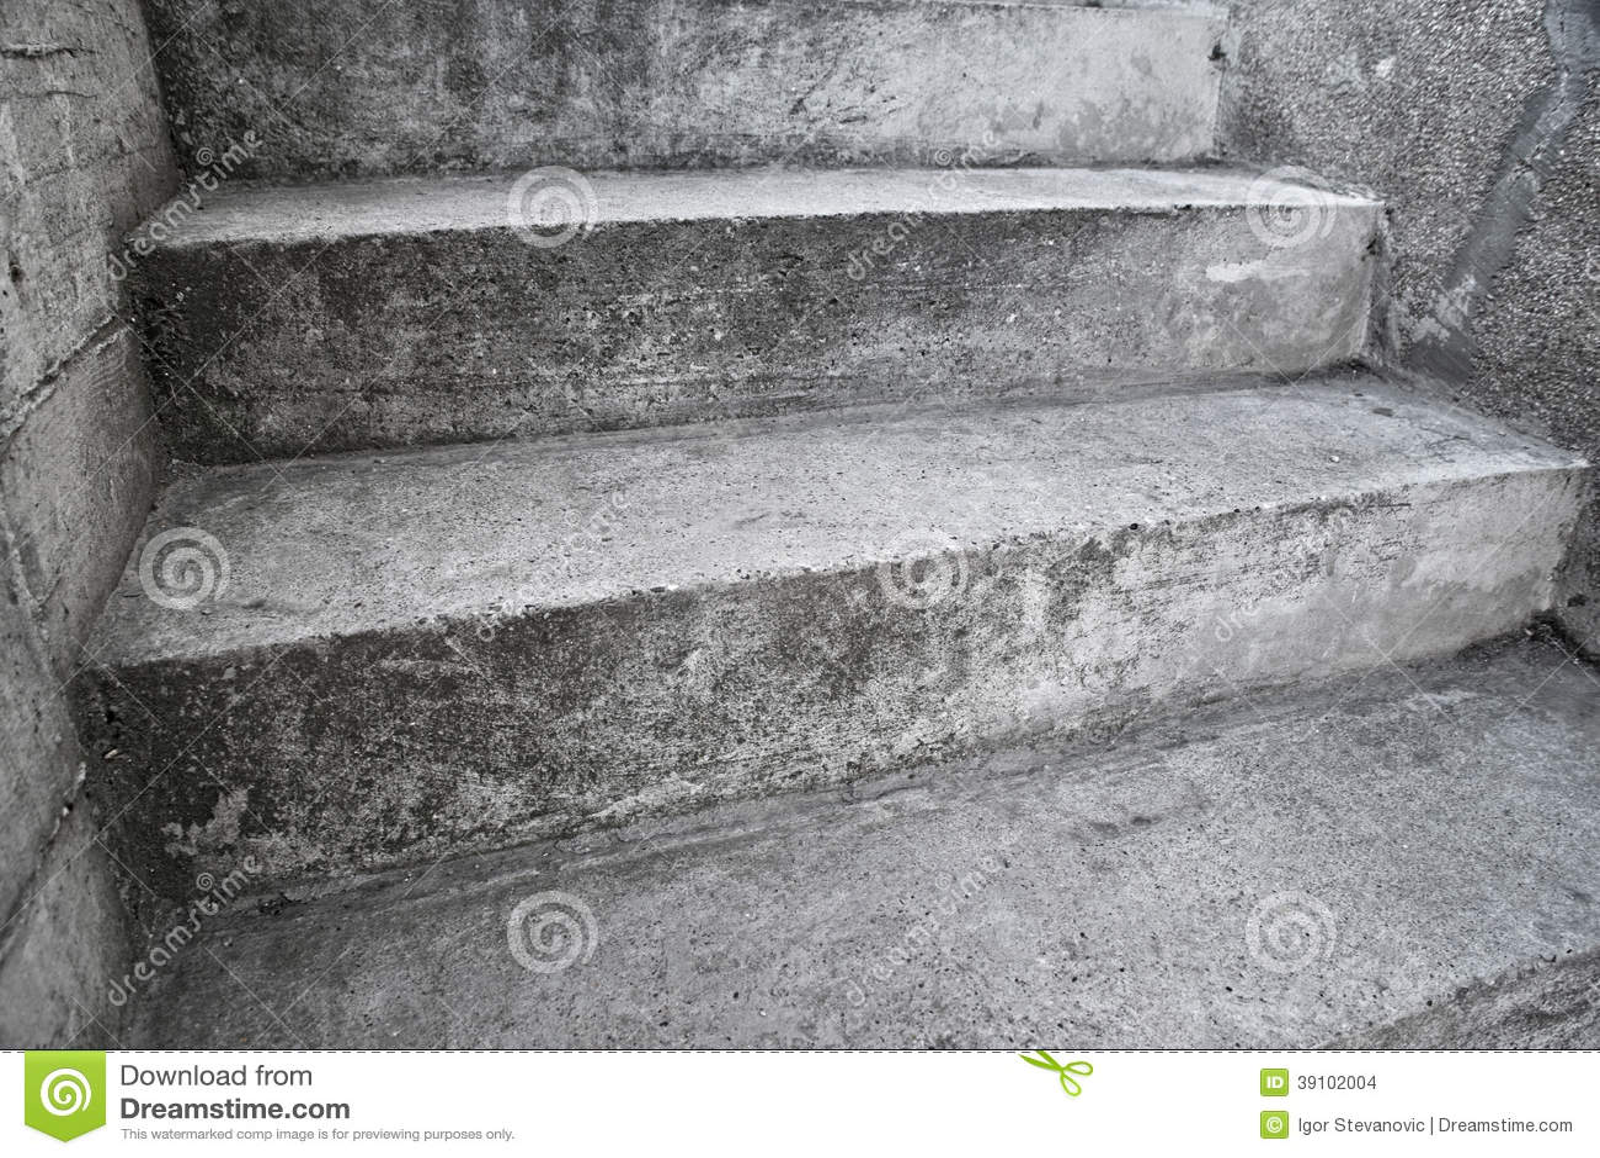 Concrete trap als abstrct samenstelling